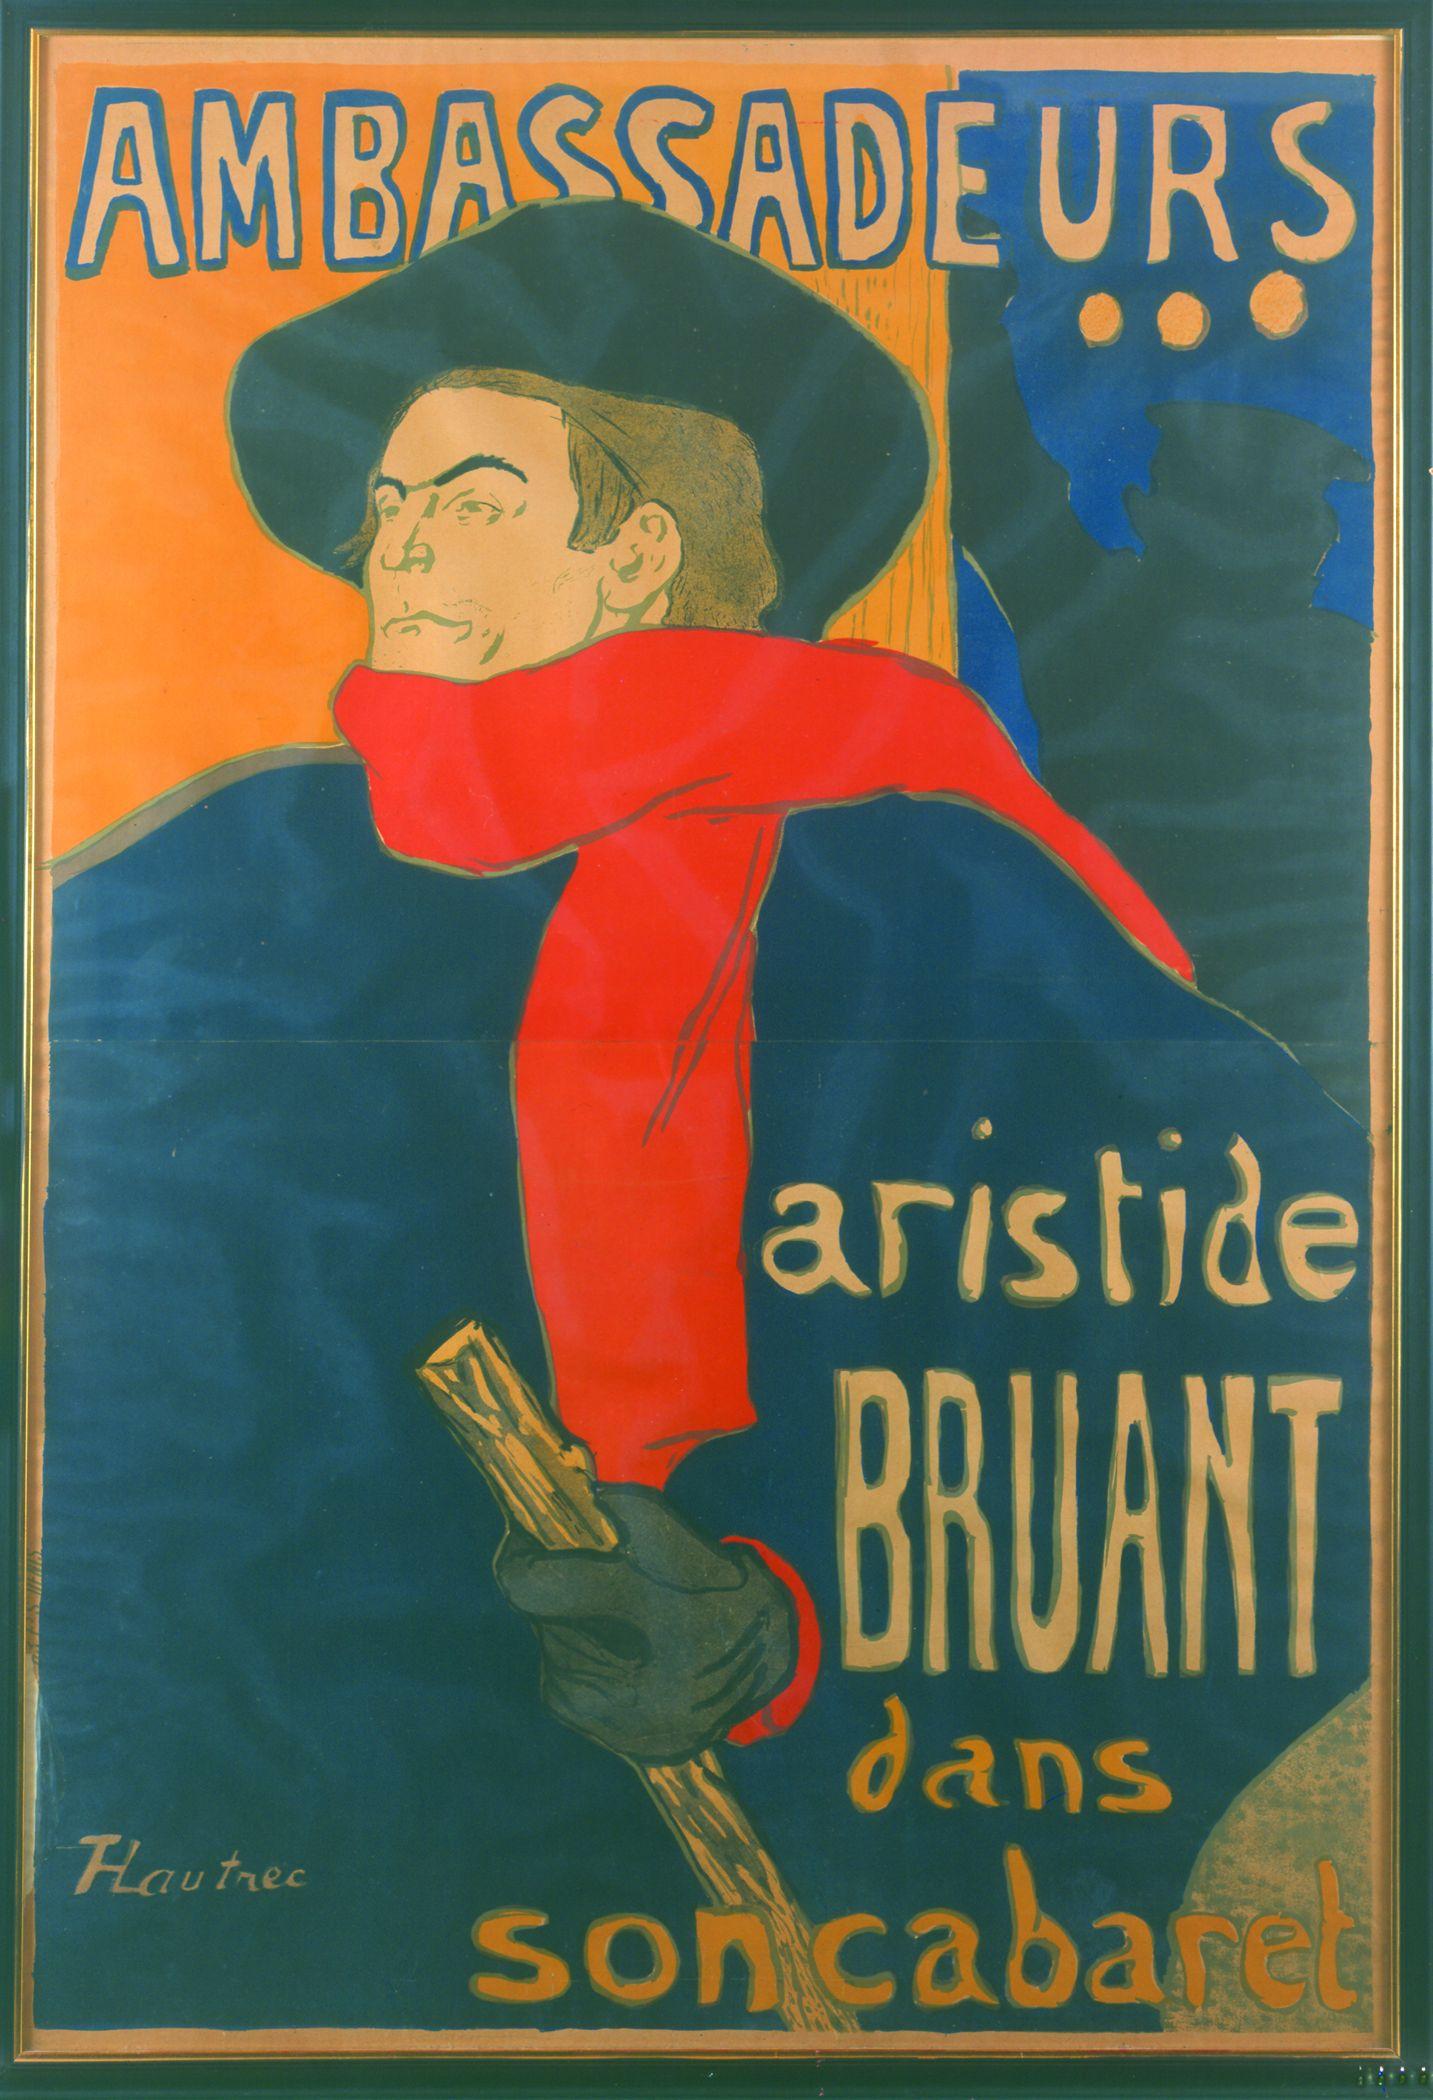 henri-de-toulouse-lautrec-1864-1901-i-ambassadeurs-aristide-bruant-i-1892-litografia-138-x-95-4-cm-coleccion-partic-2